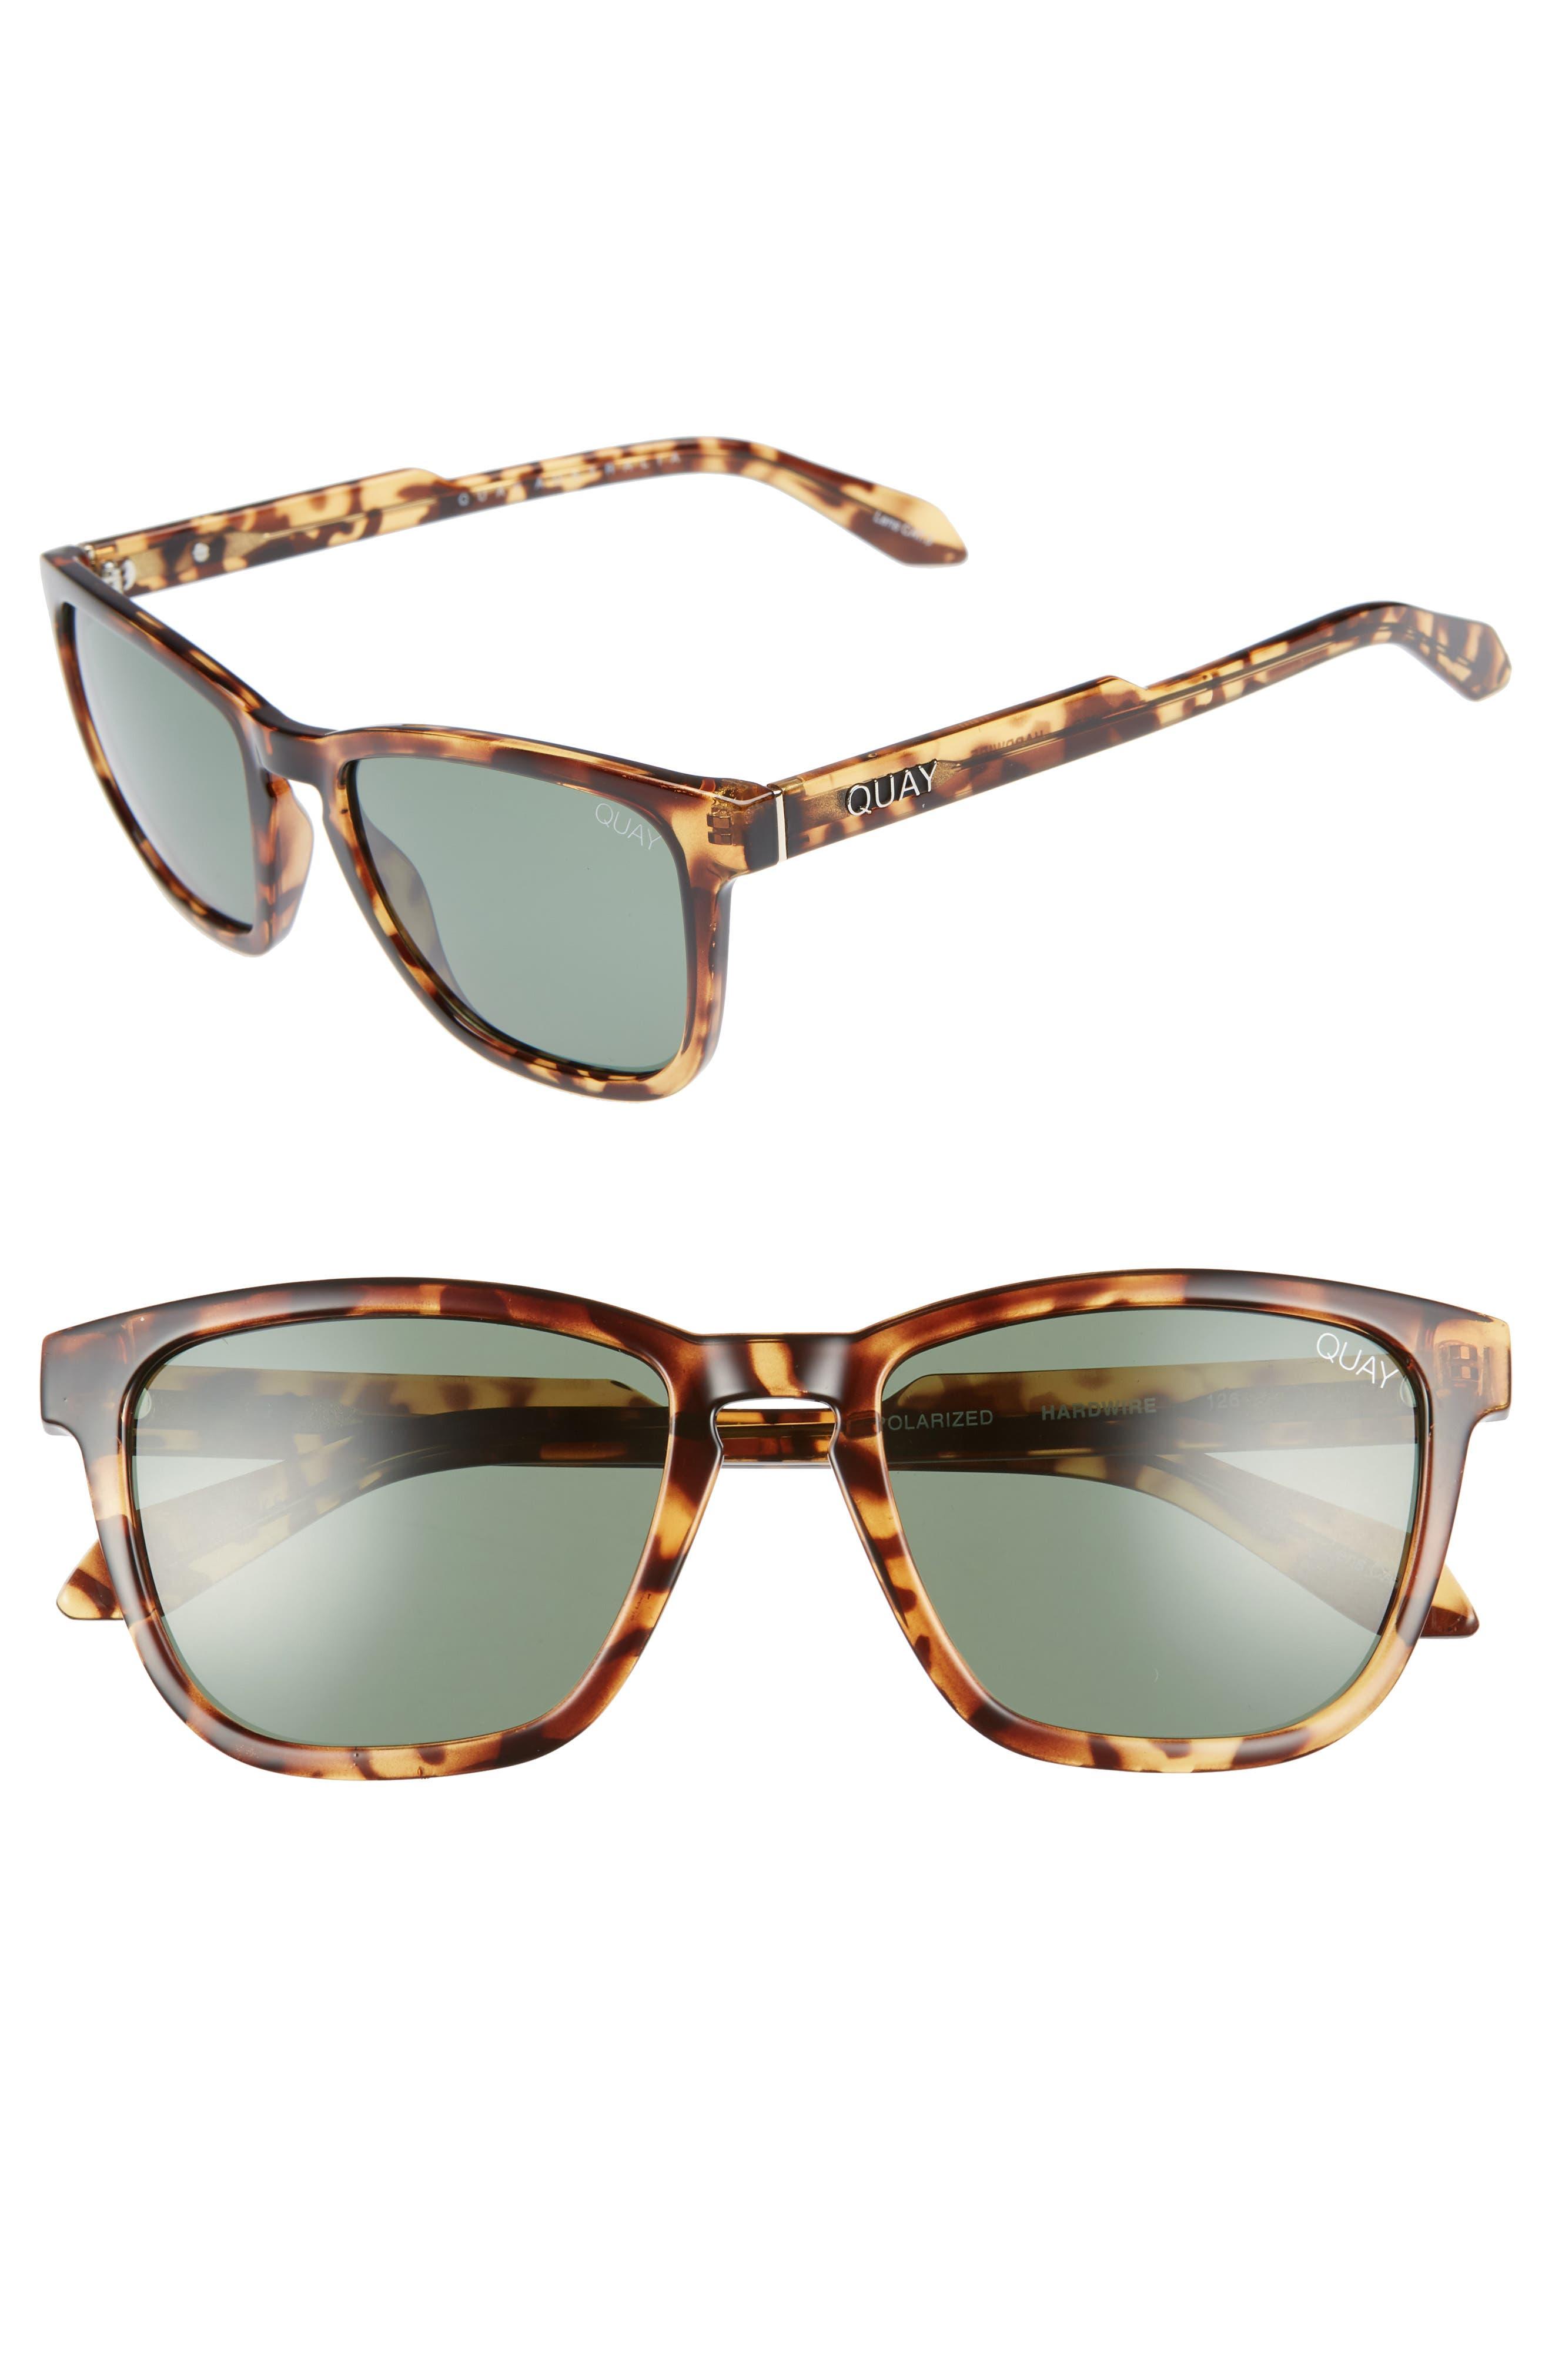 Hardwire 54mm Polarized Sunglasses,                             Main thumbnail 1, color,                             TORT/ GREEN LENS